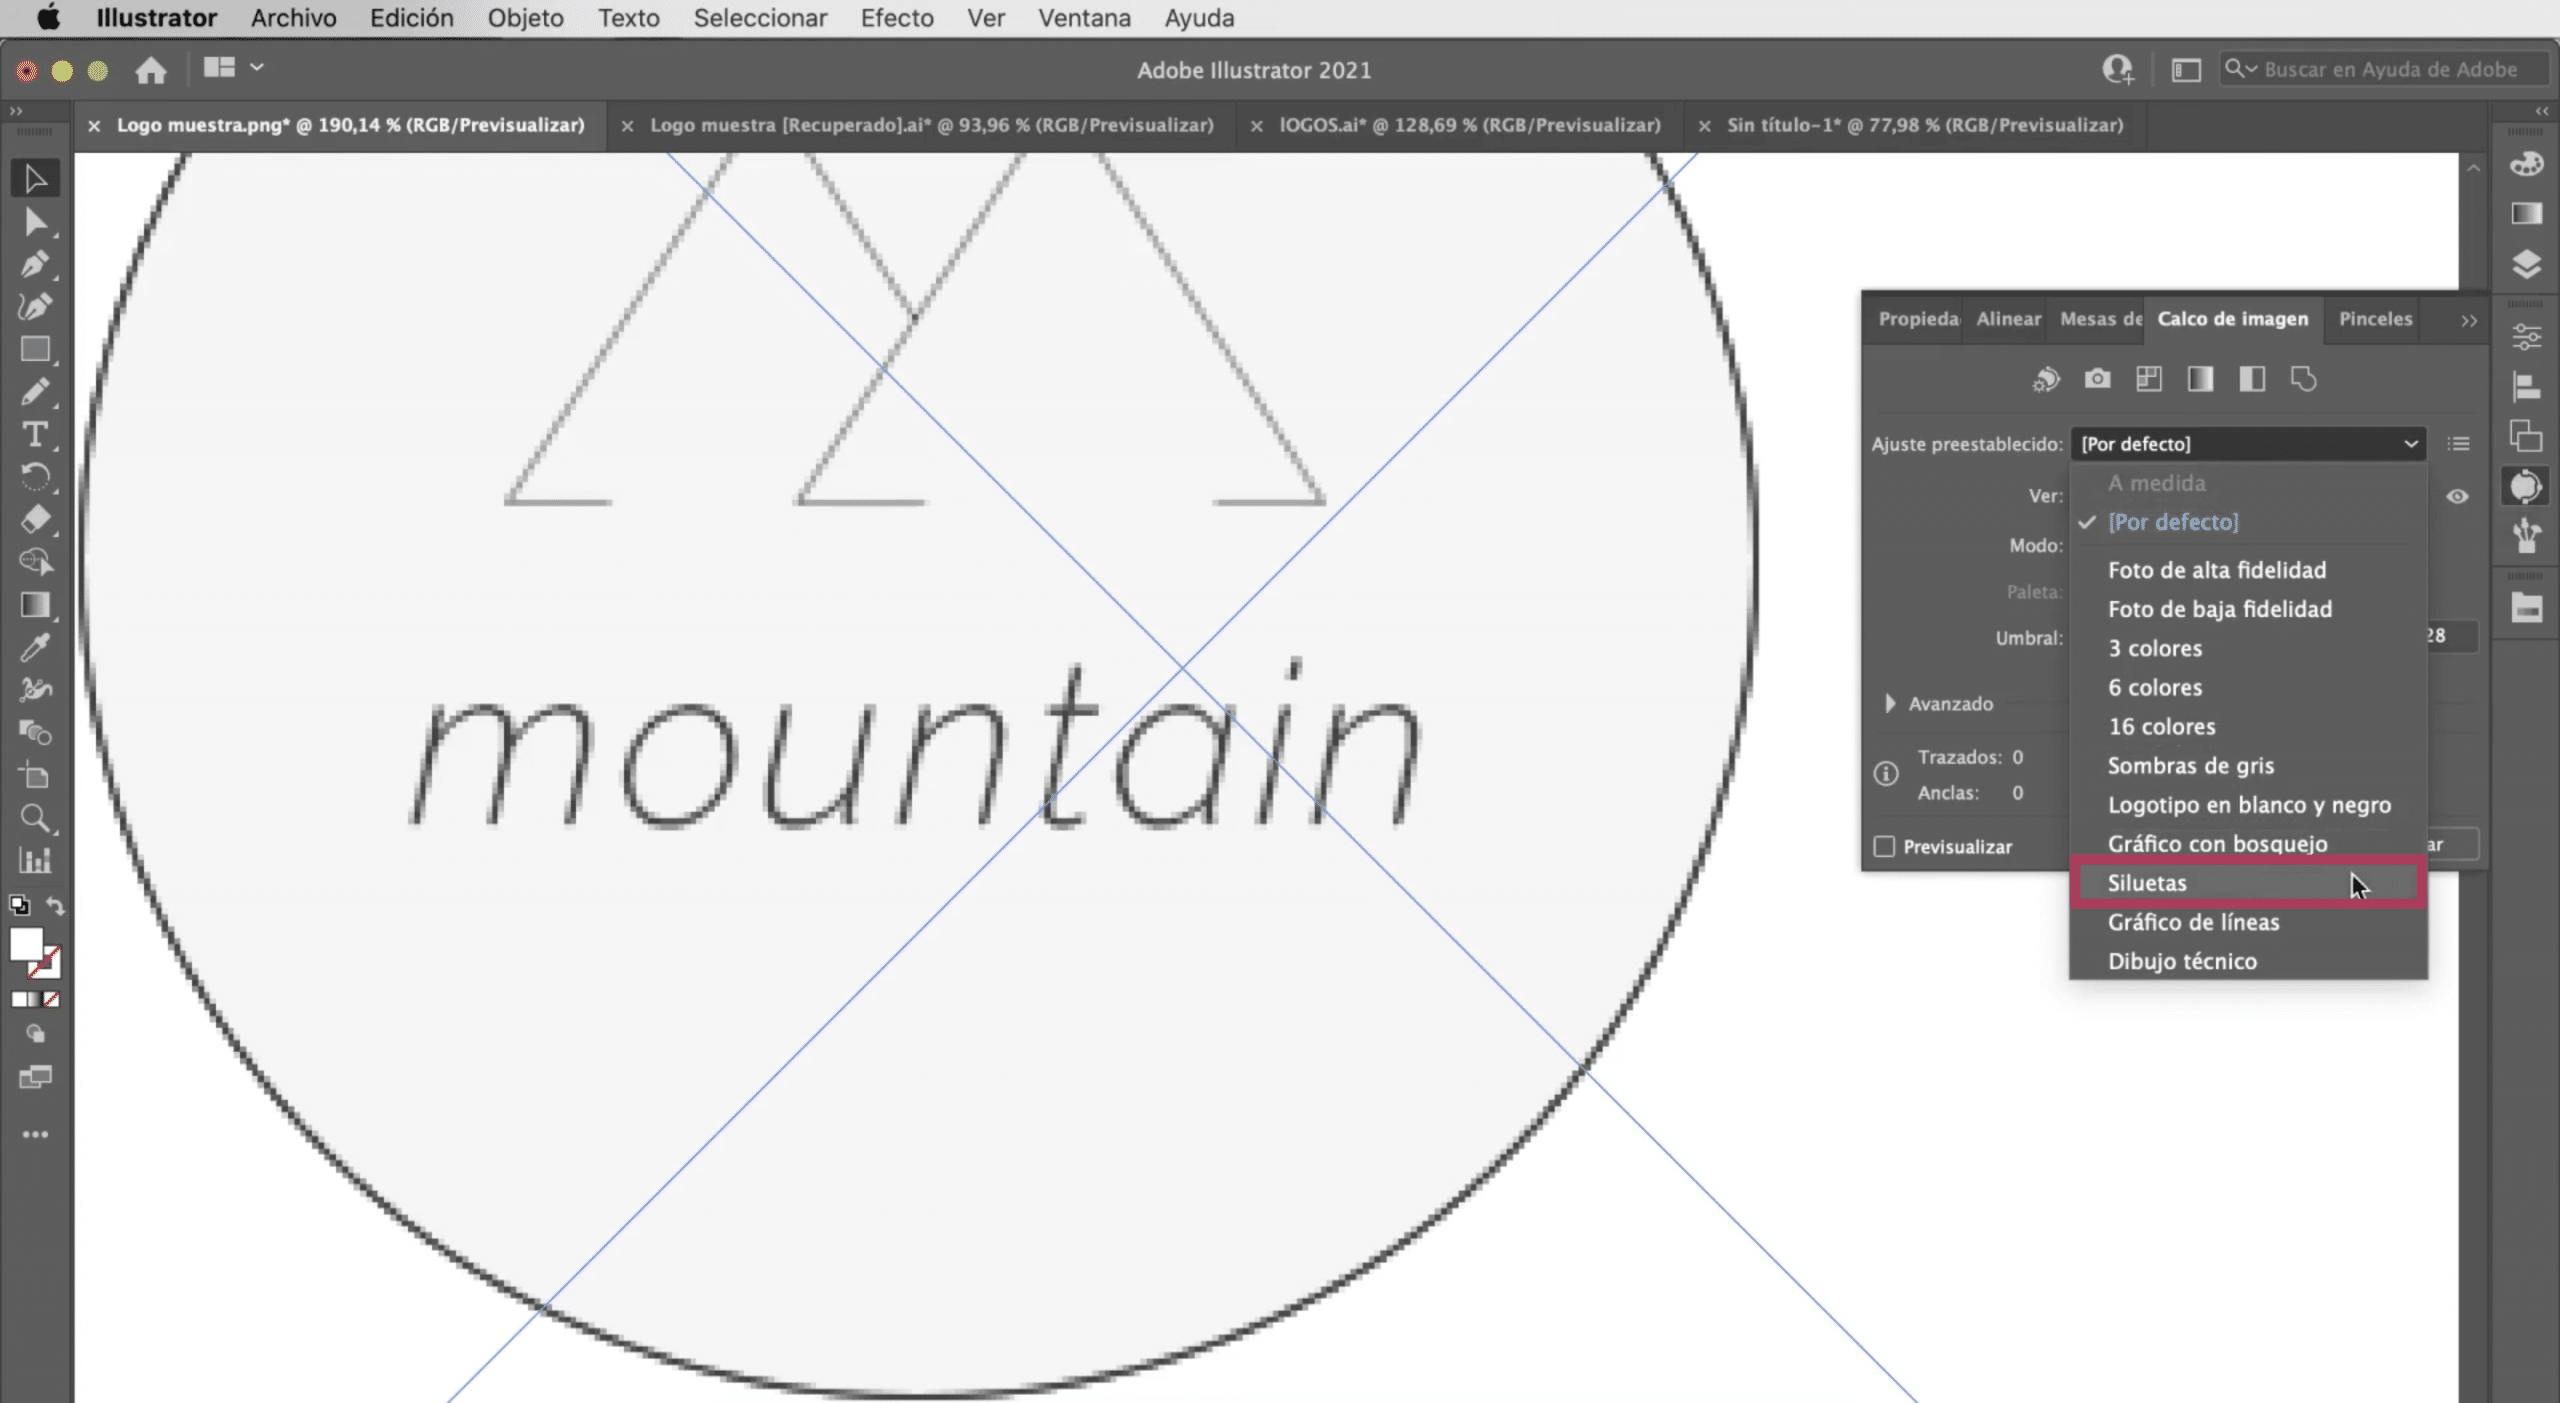 Hacer calco de imagen en Illustrator